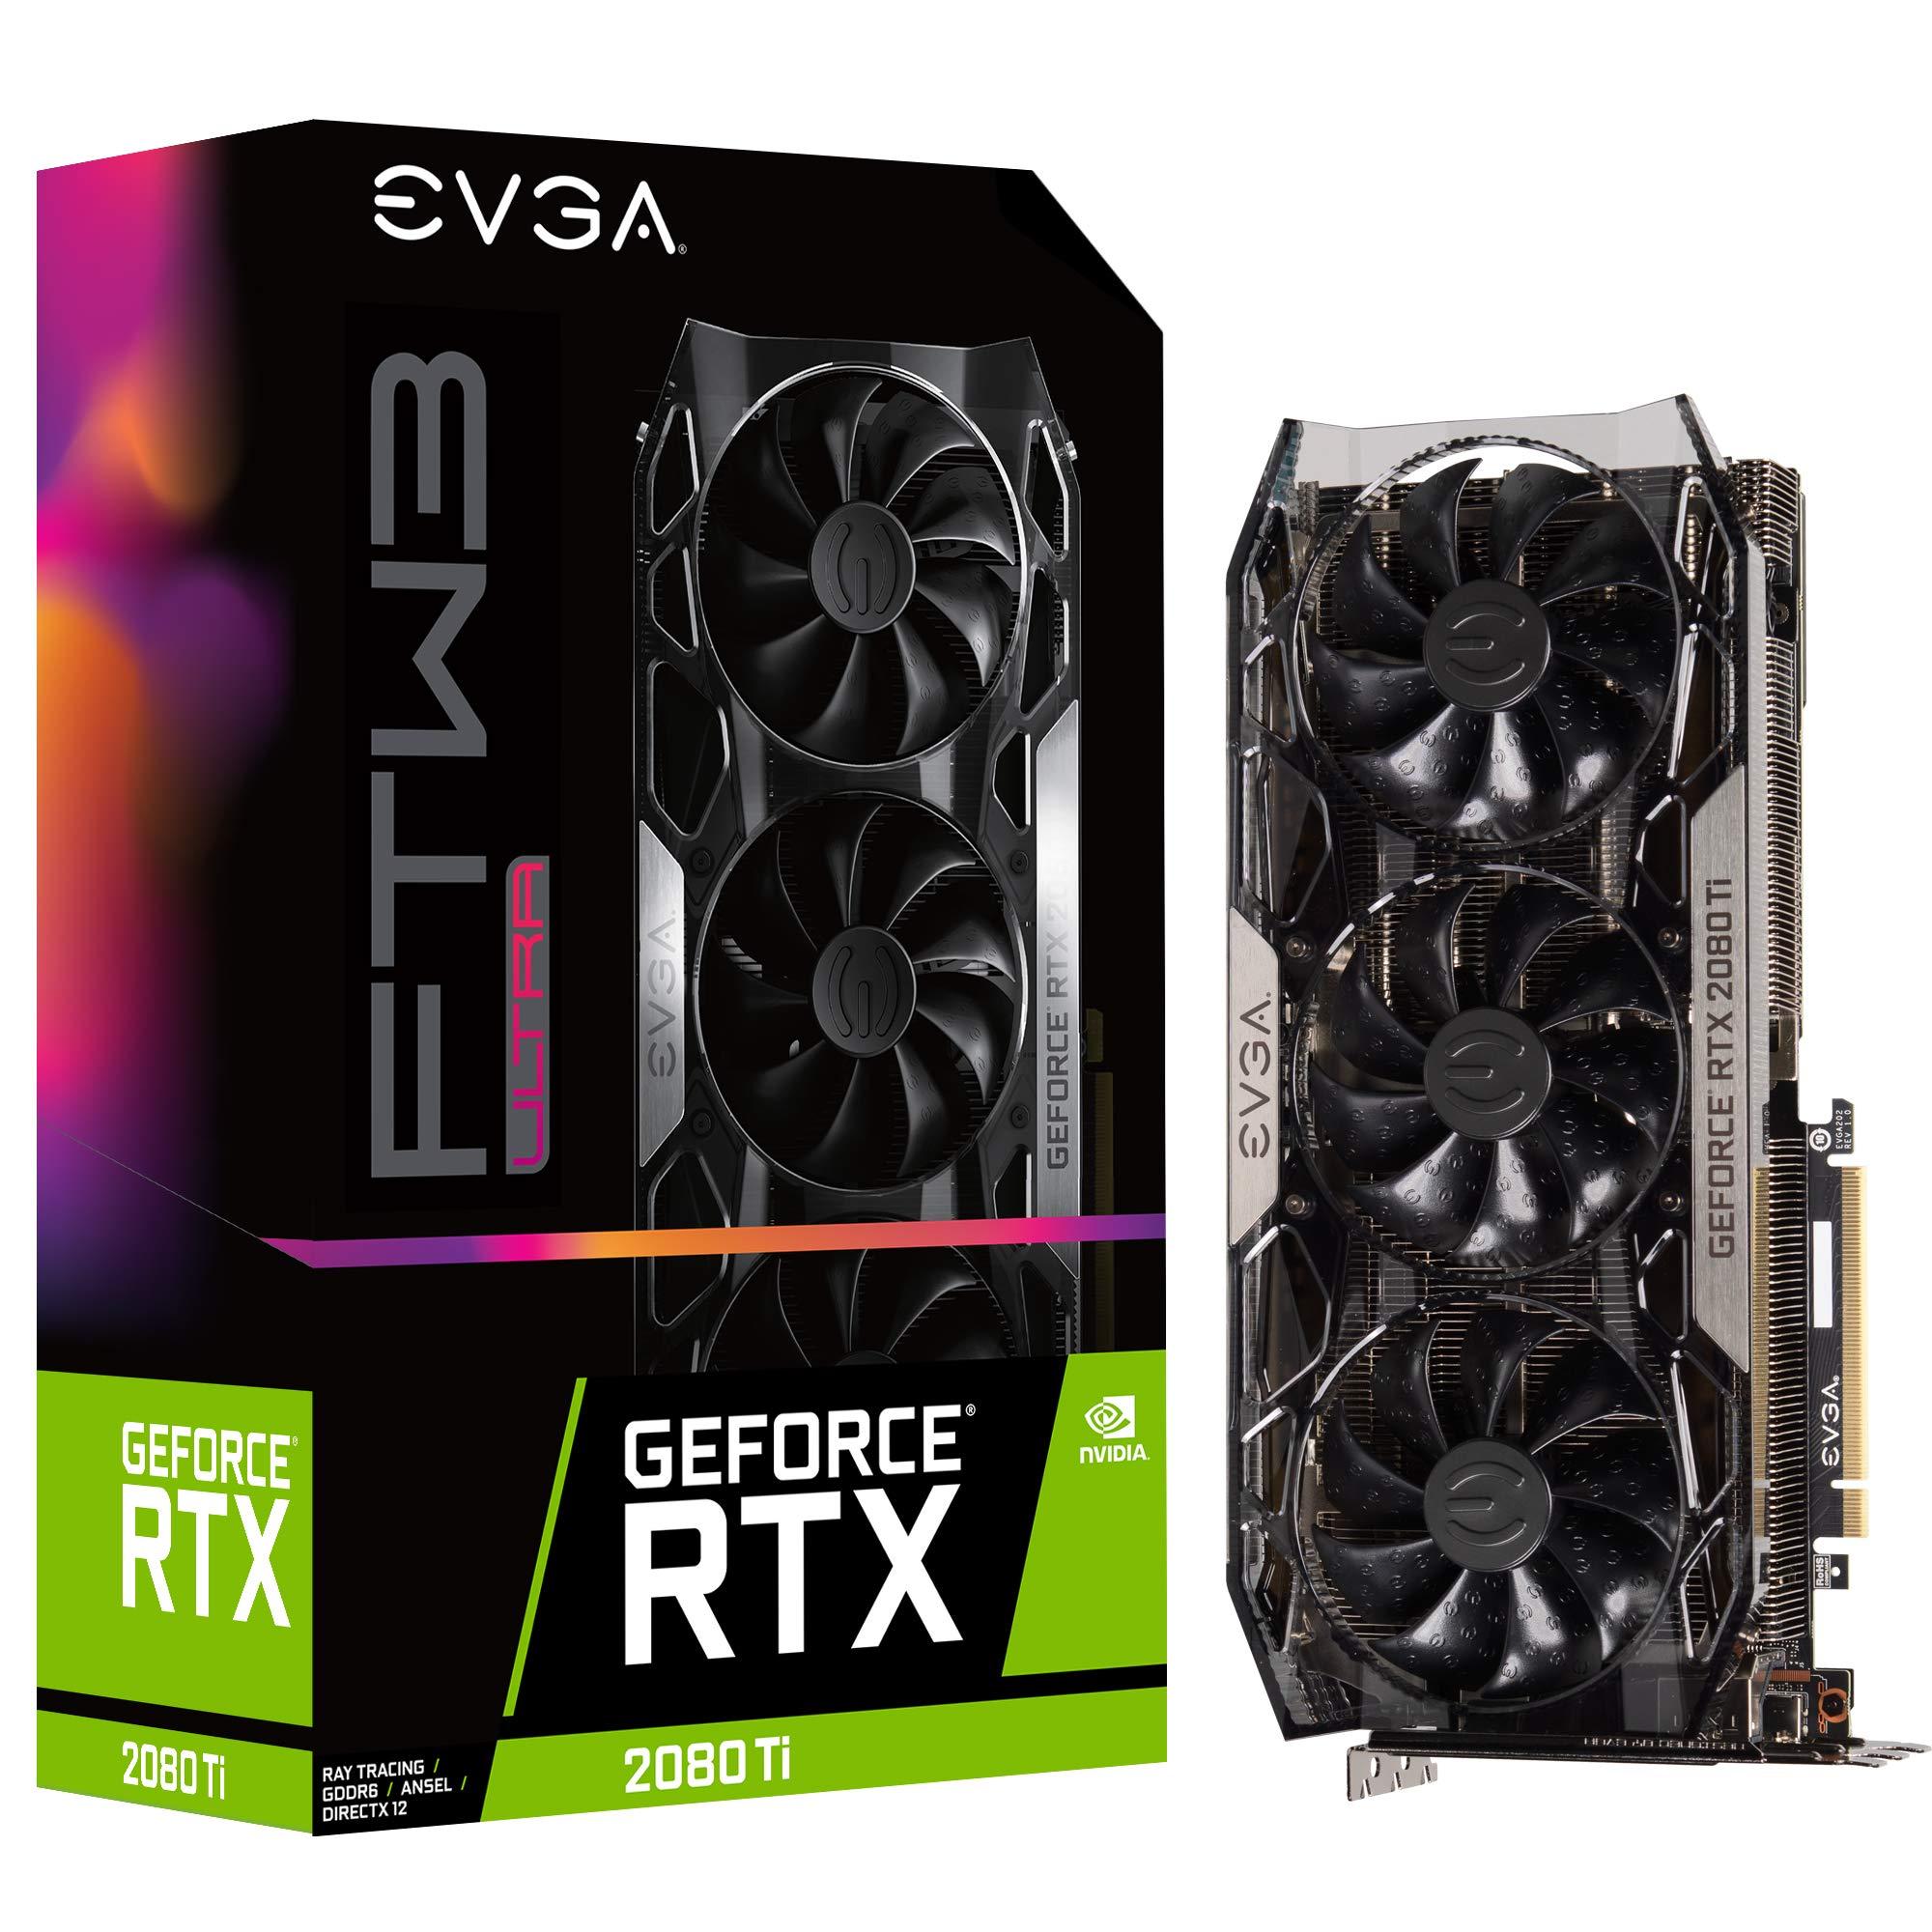 EVGA GeForce RTX 2080 Ti FTW3 Ultra Gaming, 11GB GDDR6, iCX2 & RGB LED Graphics Card 11G-P4-2487-KR by EVGA (Image #1)